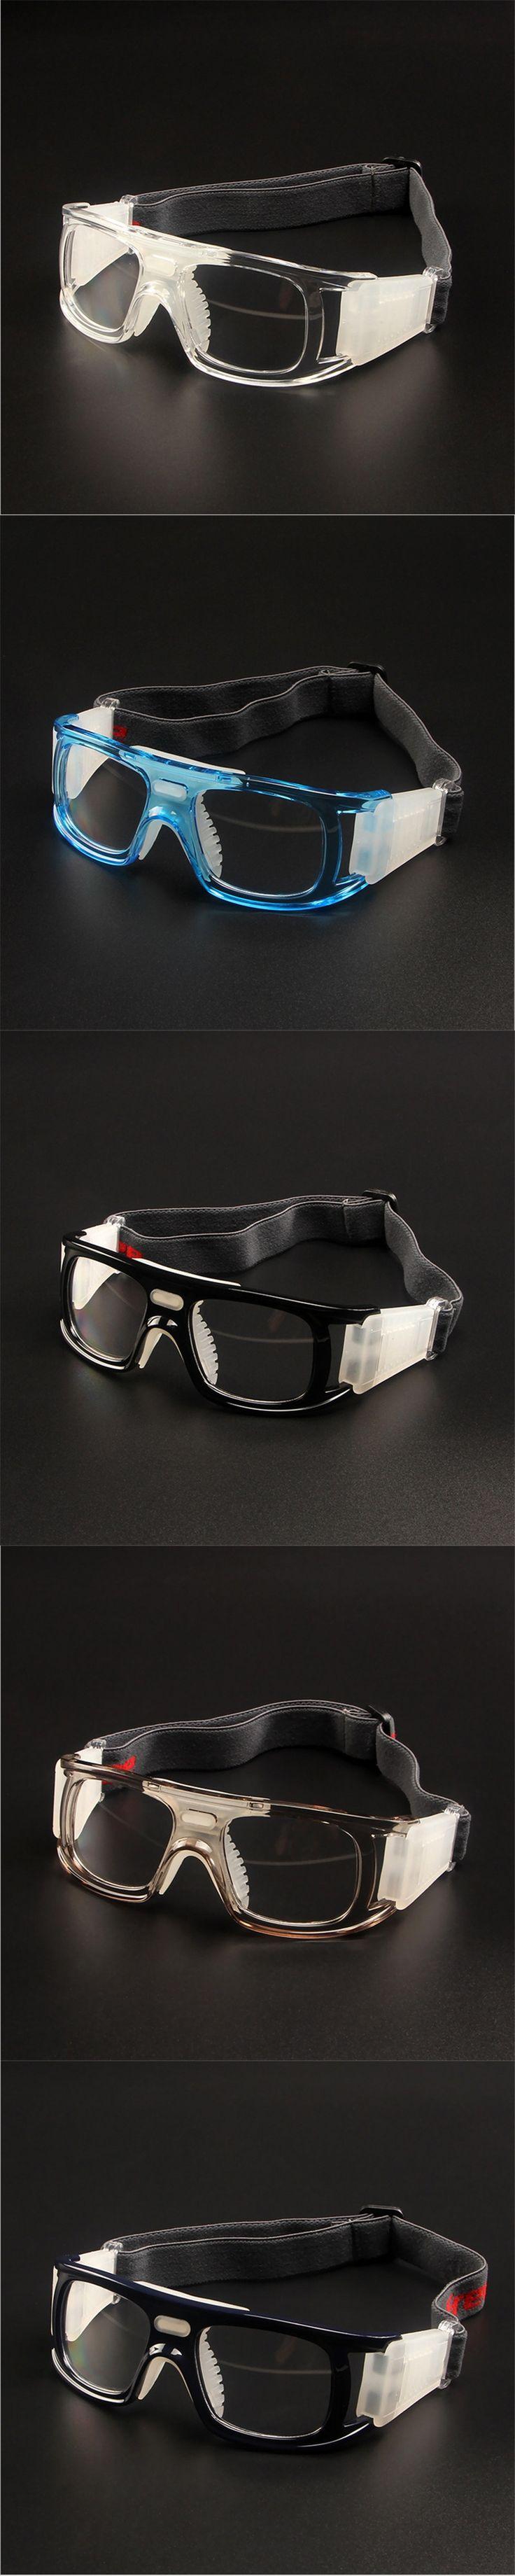 Sports glasses Basketball glasses Prescription glass frame football Protective eye Outdoor custom optical frame dx016